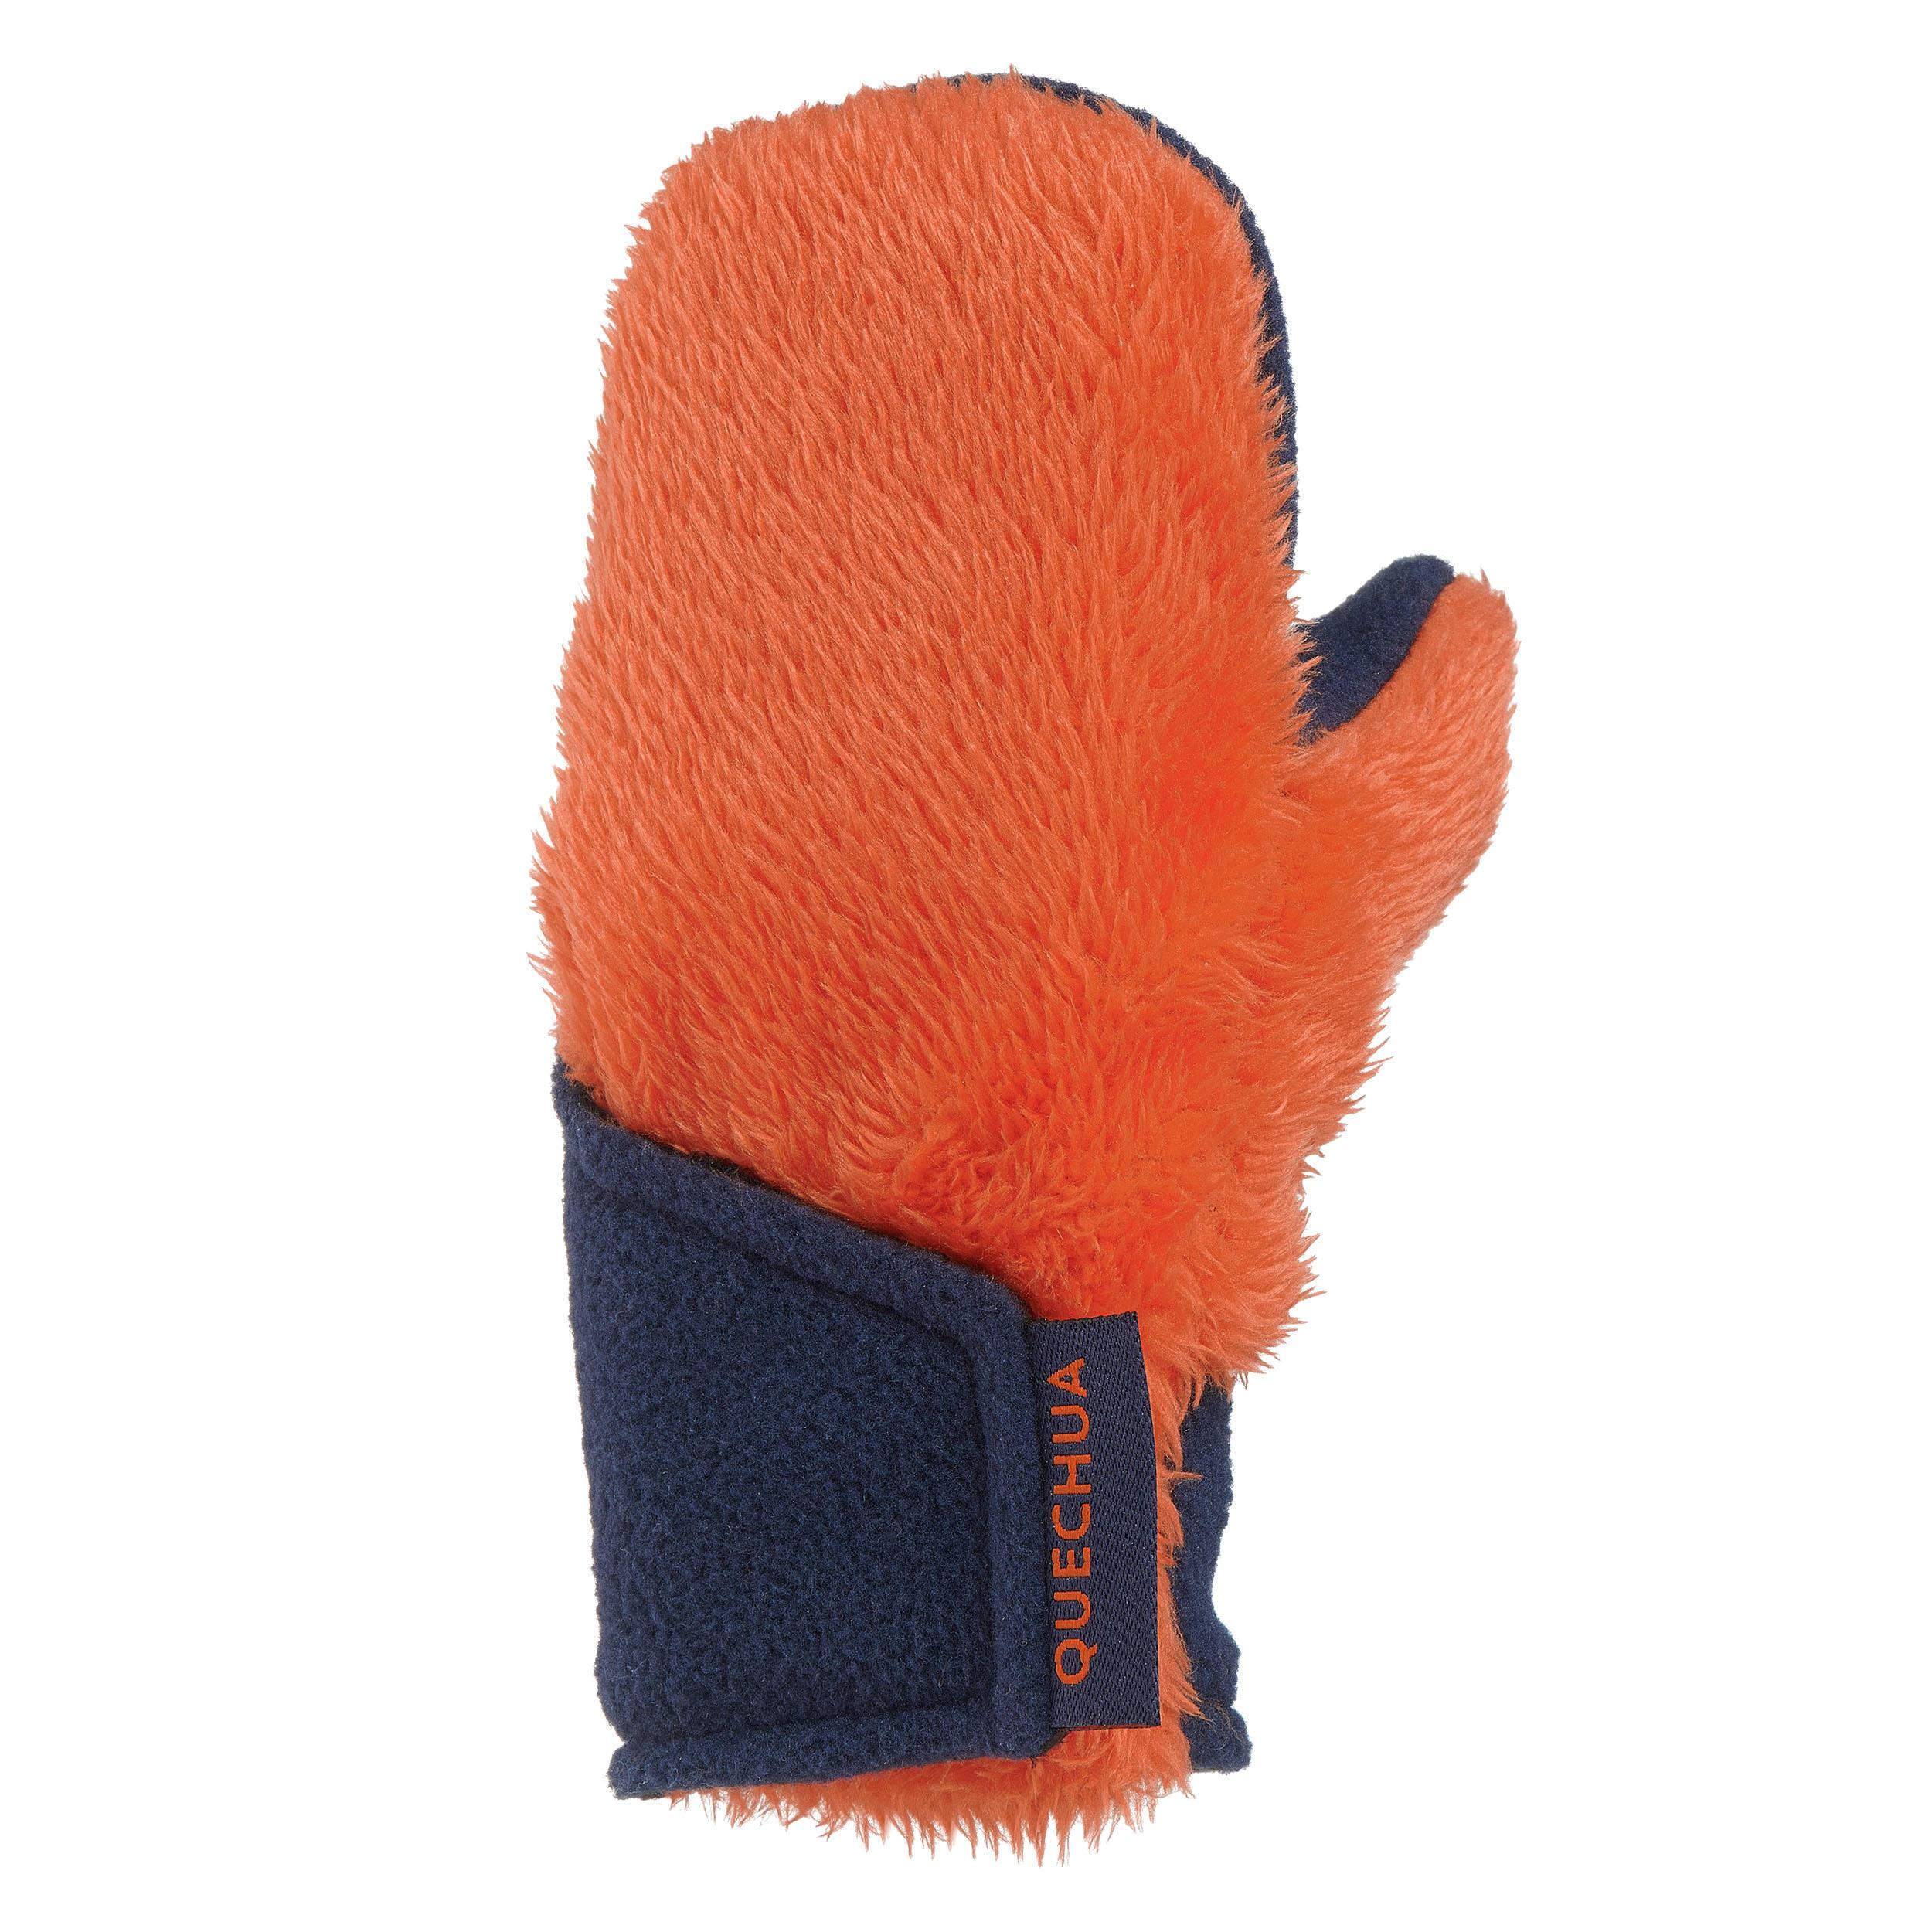 Mănuși Drumeție SH100 Copii imagine produs